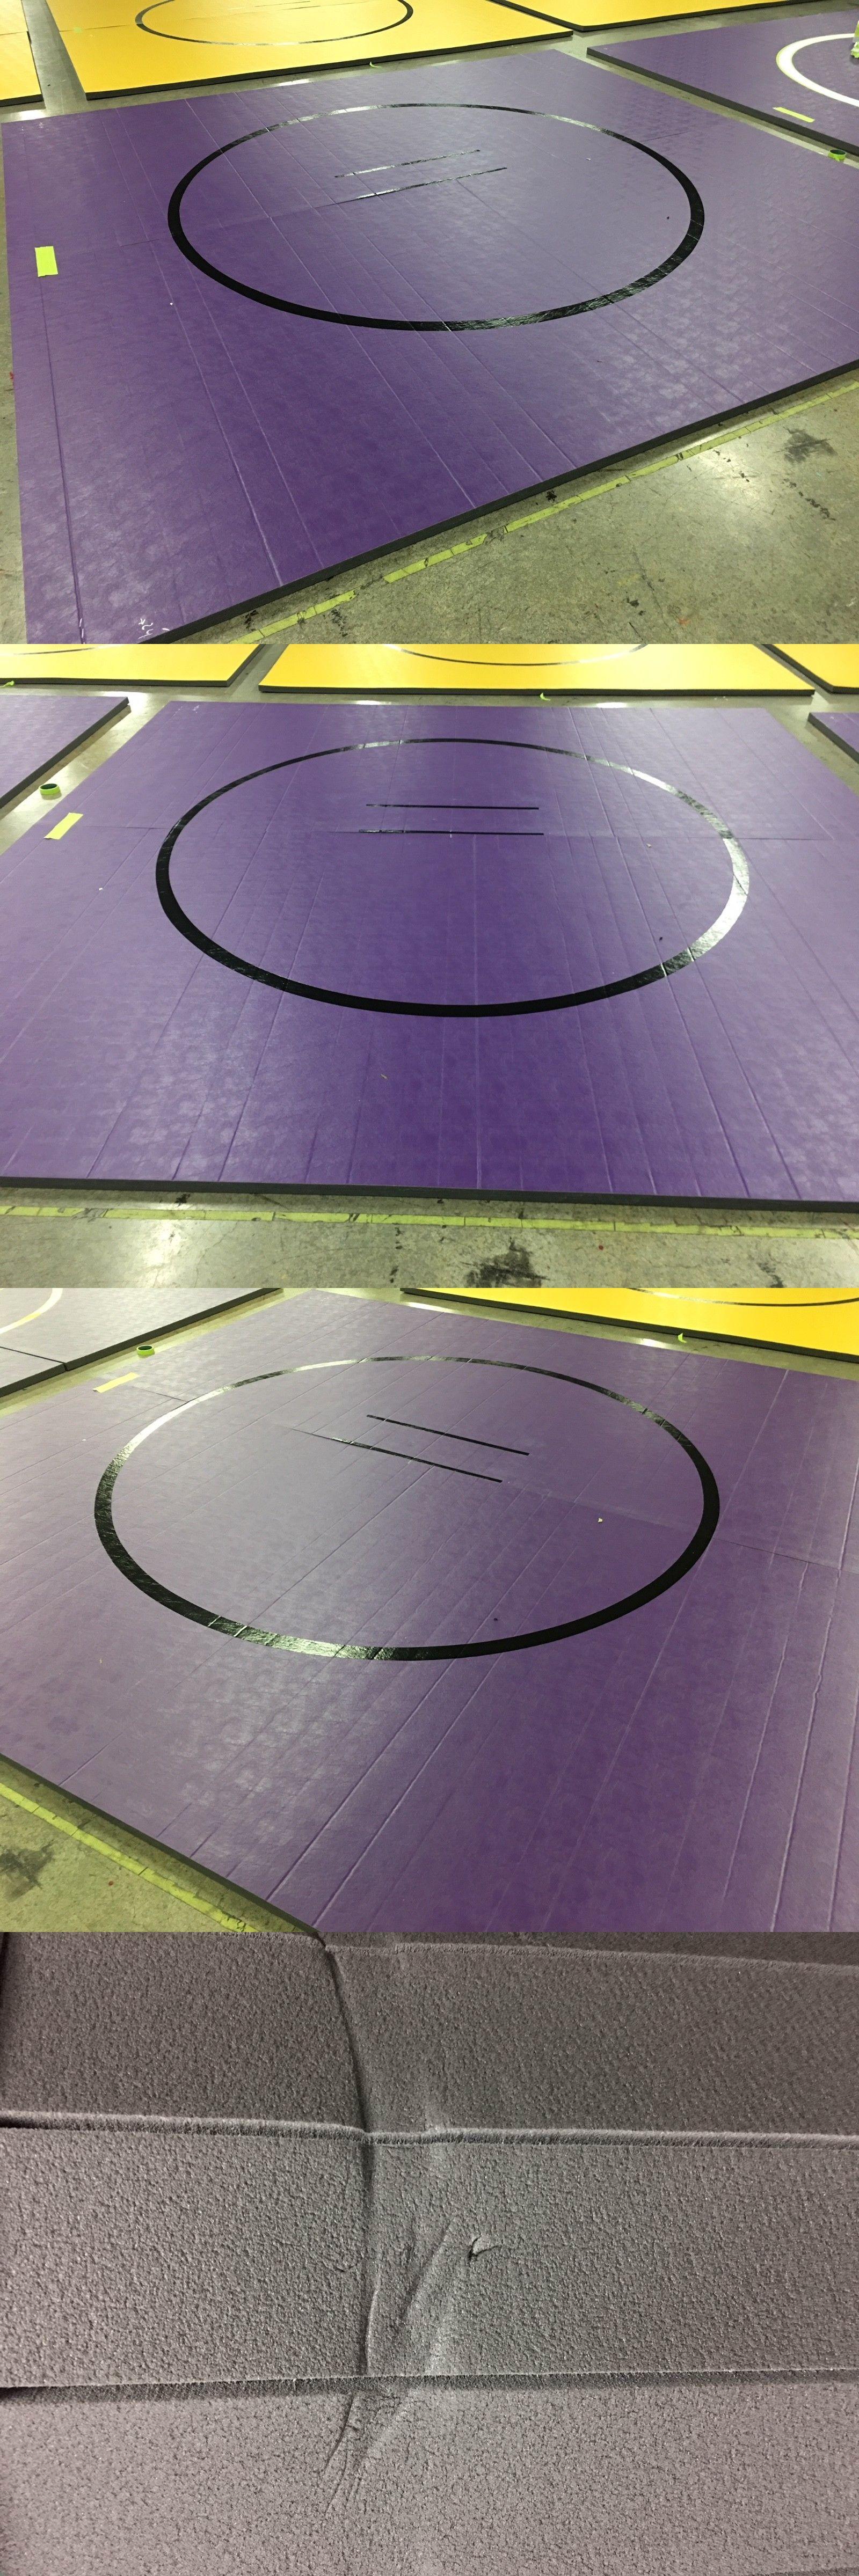 youth wrestling jpg mat sale index mats cheap for indianamat wrestlingmat